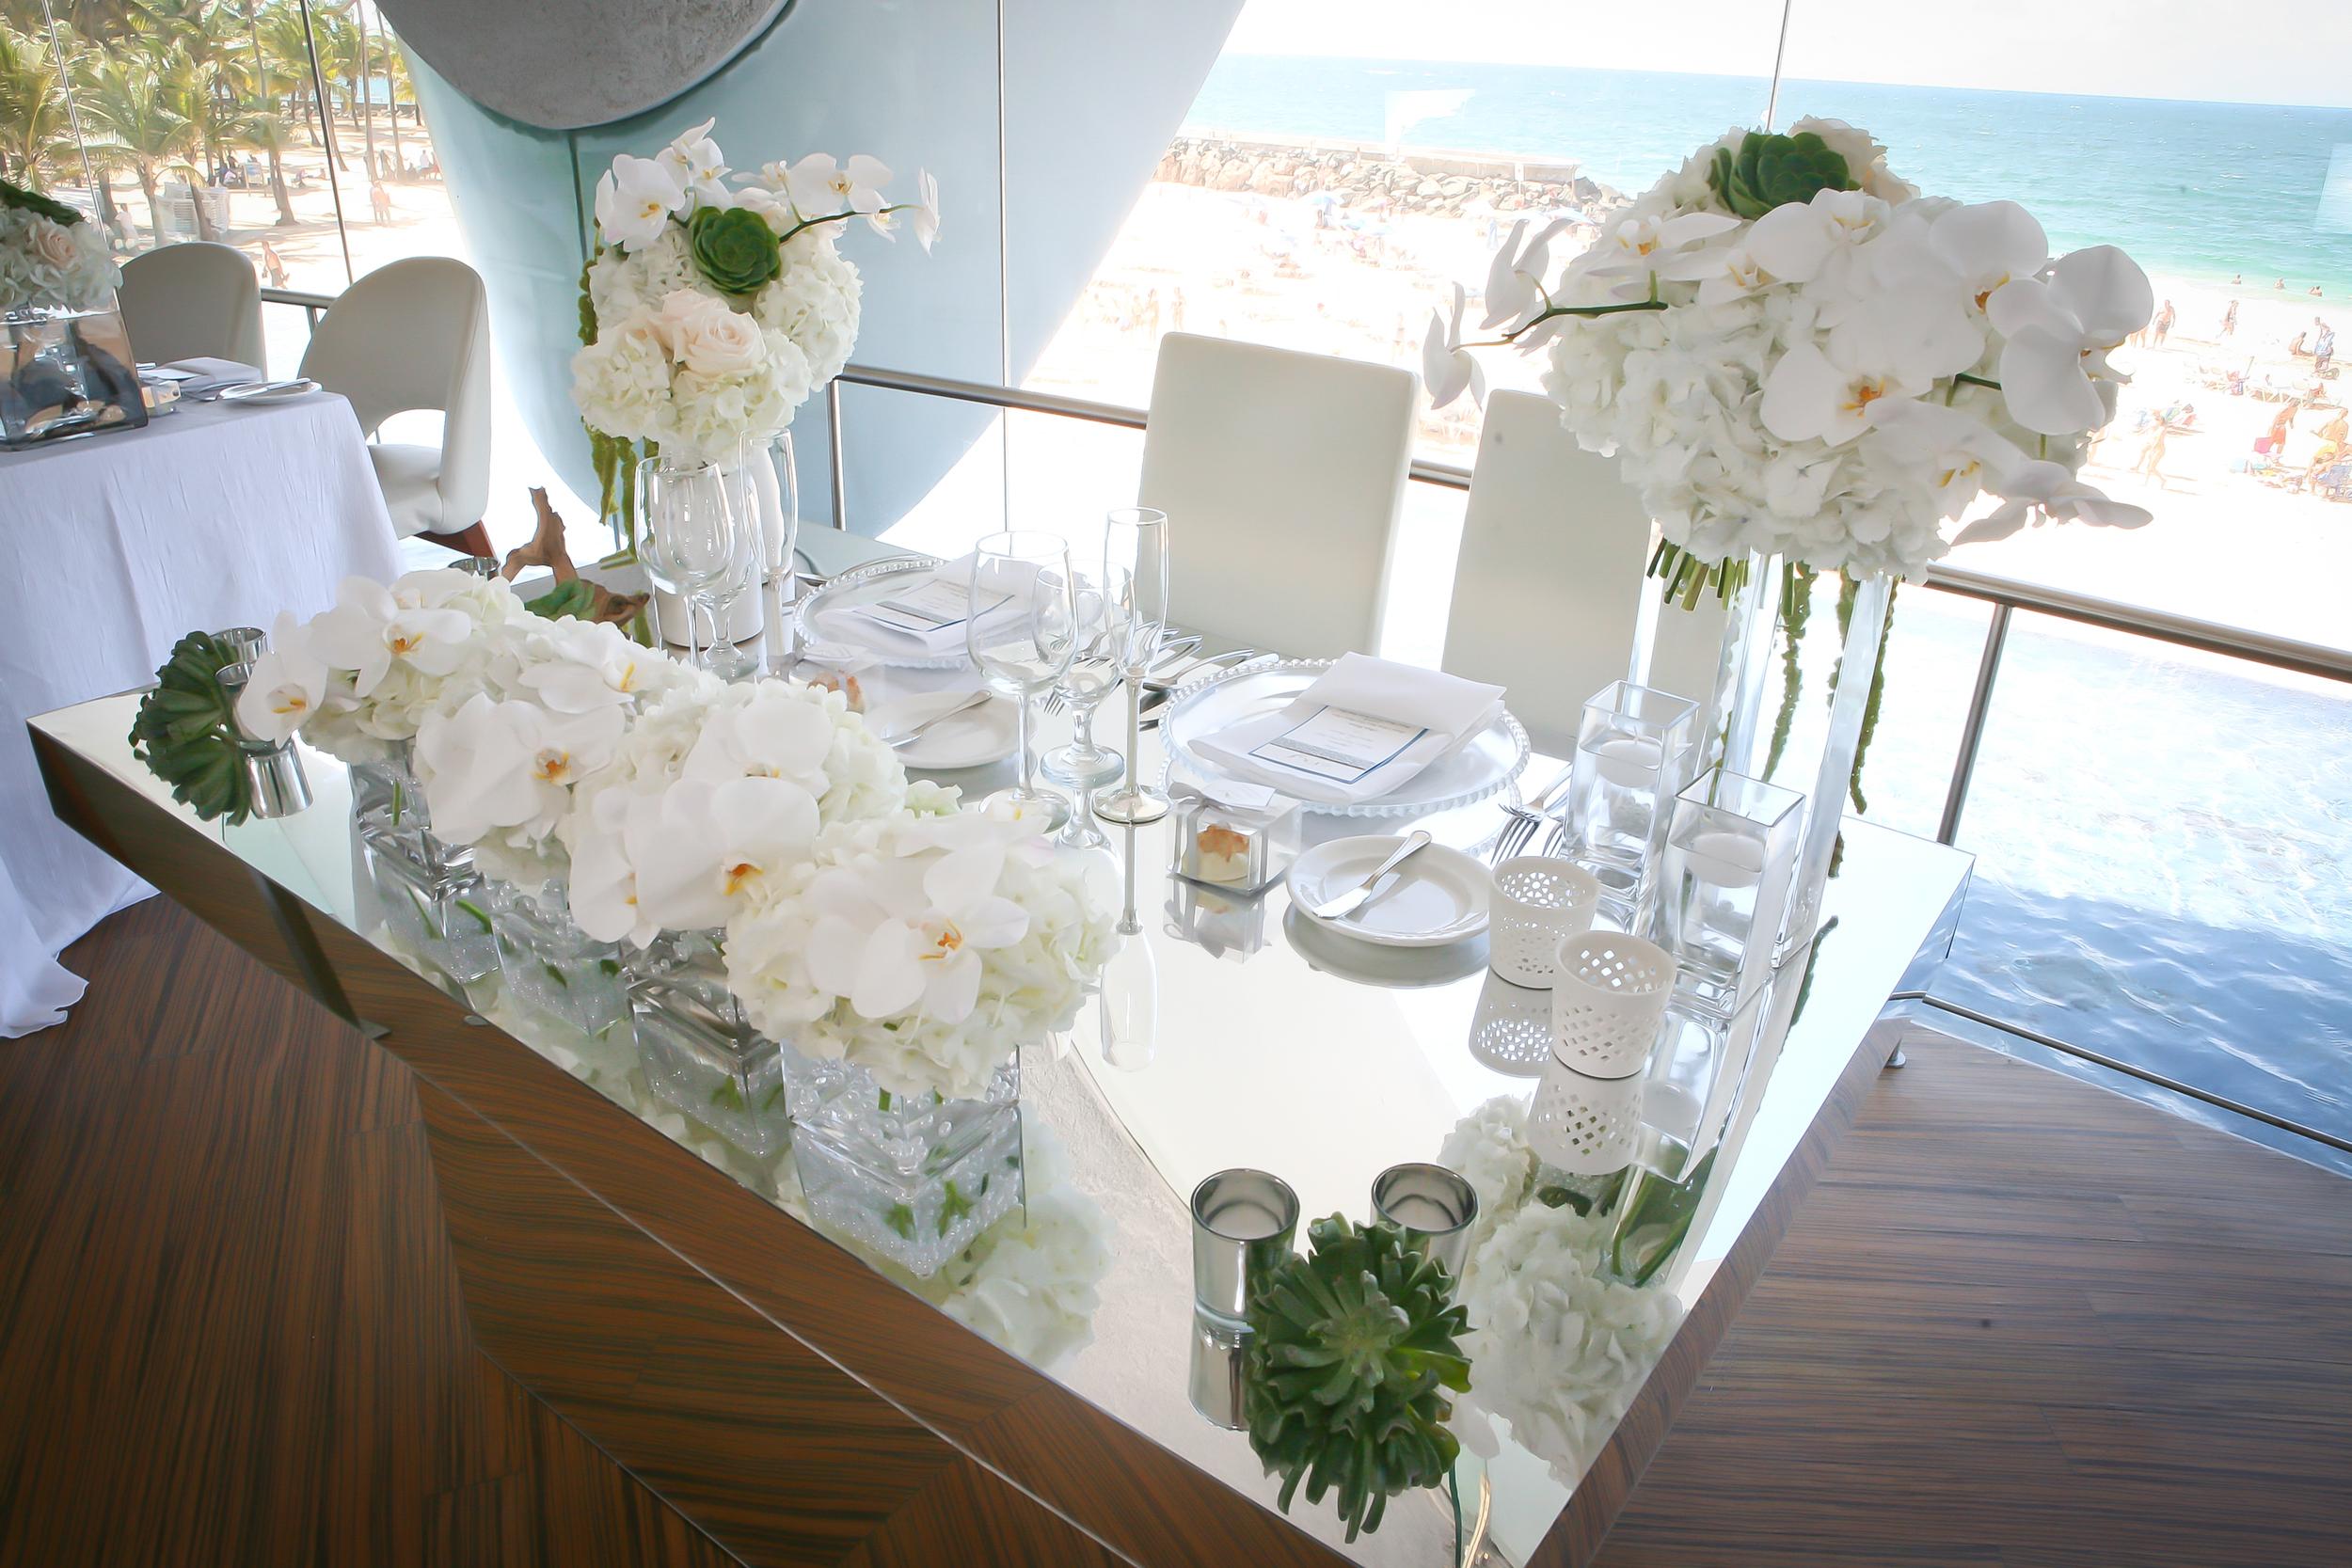 Mirror Couple's Table